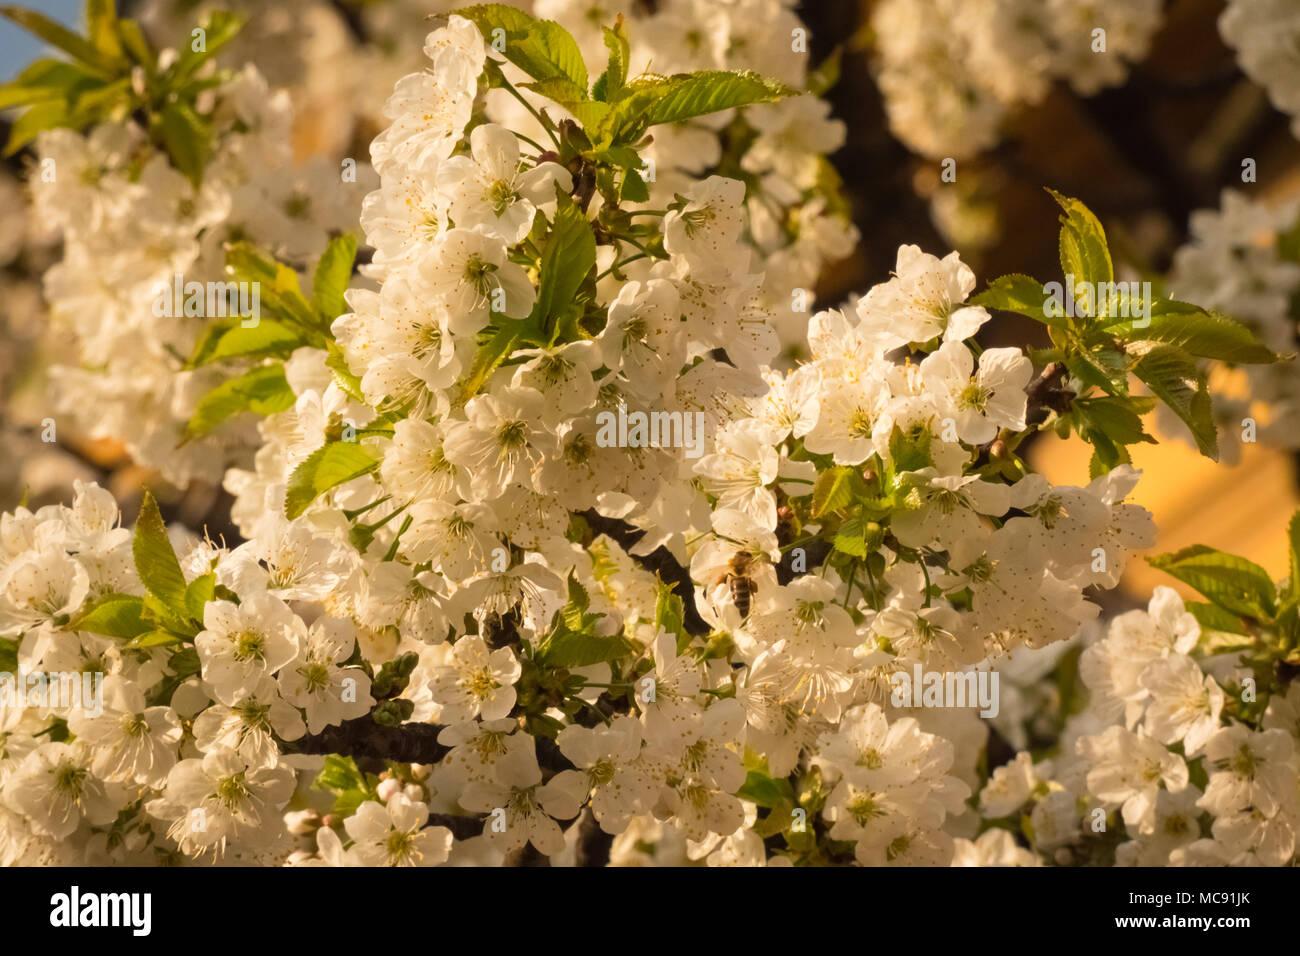 Weißen Kirschblüten im Frühling. Prunus avium. Stockbild